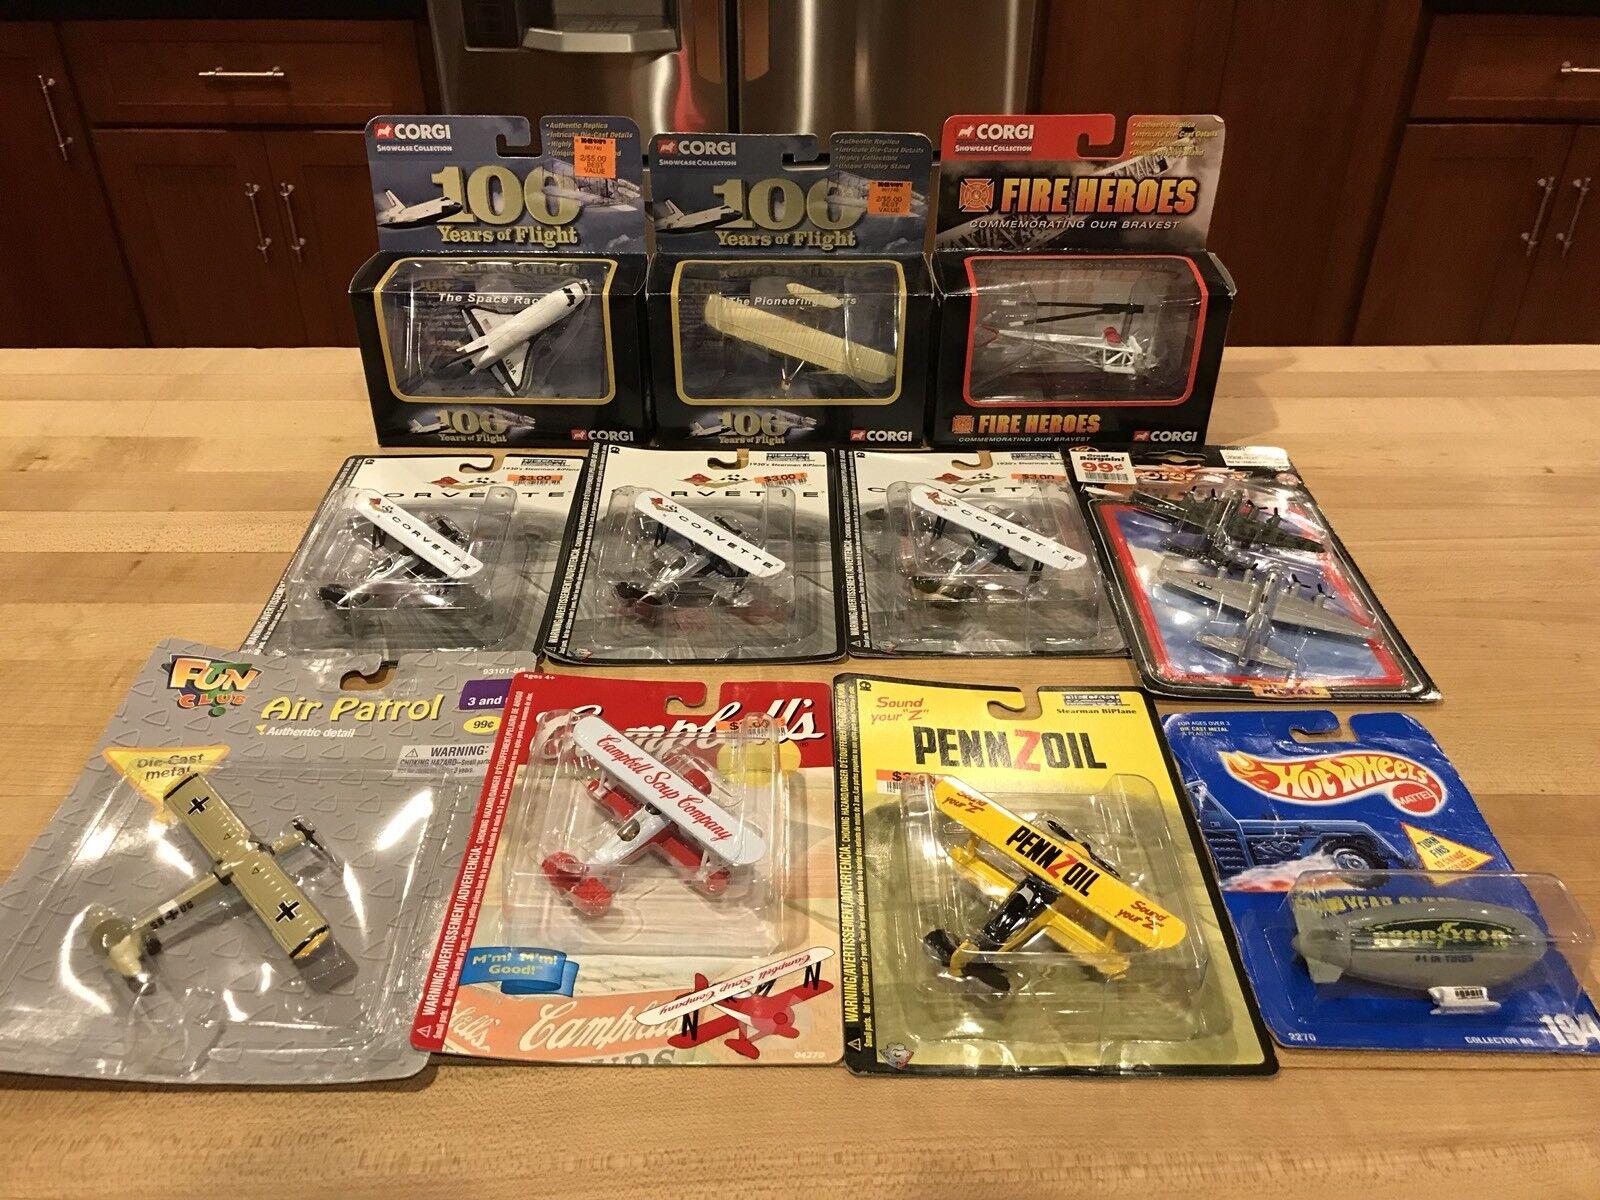 11 Jouet Avions COLLECTION Neuf sous emballage CORGI Gearbox Hot Wheels Fun Club rouge Box photos